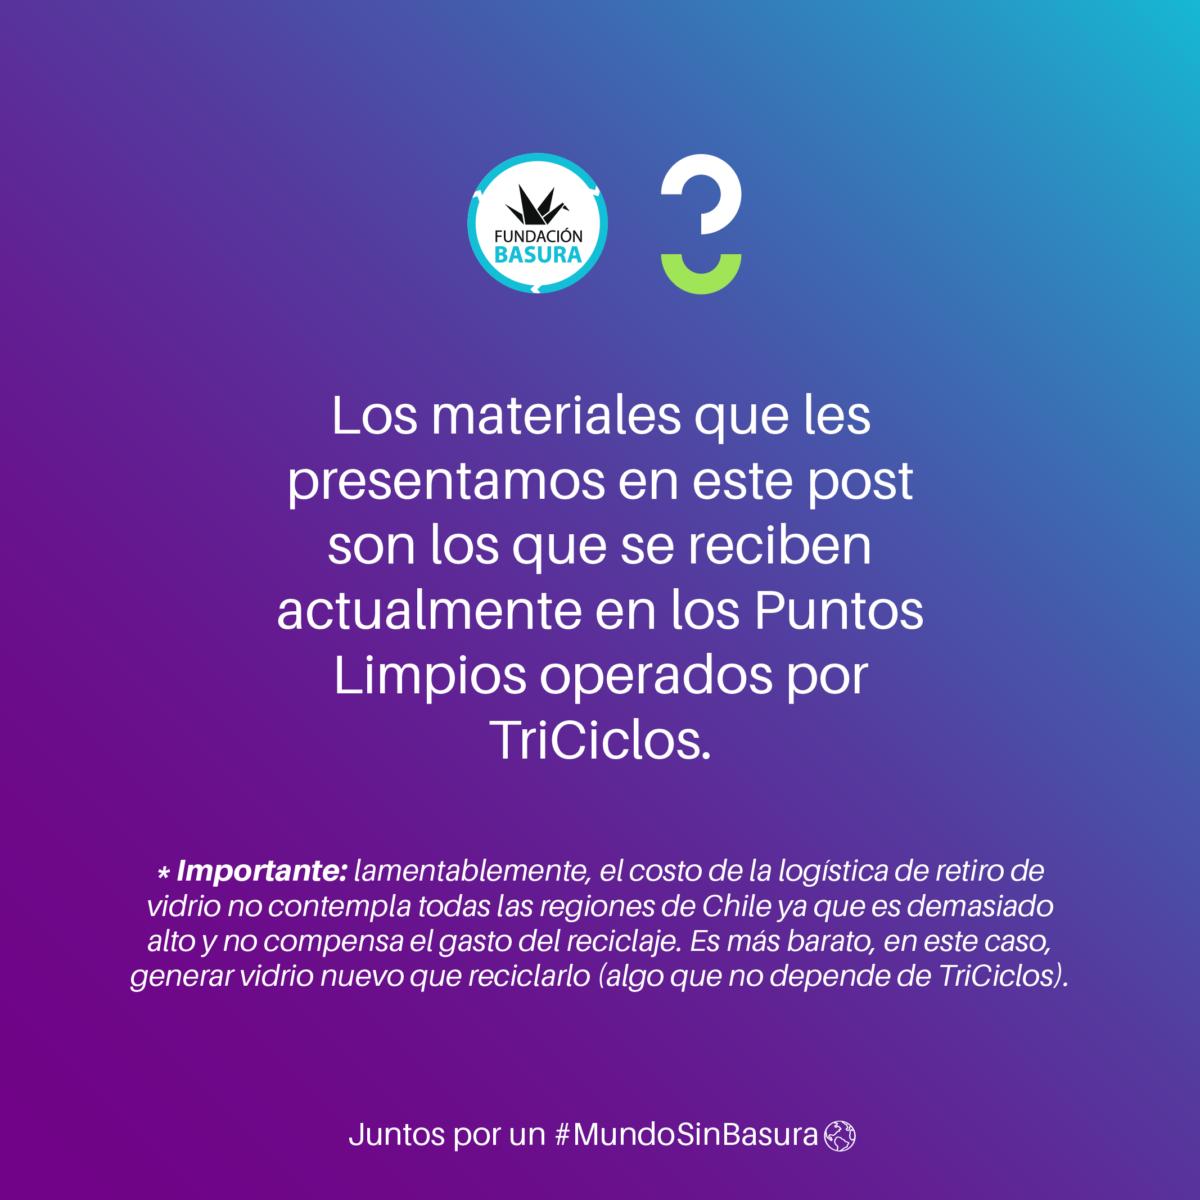 Post_Transformacion_Materiales_2